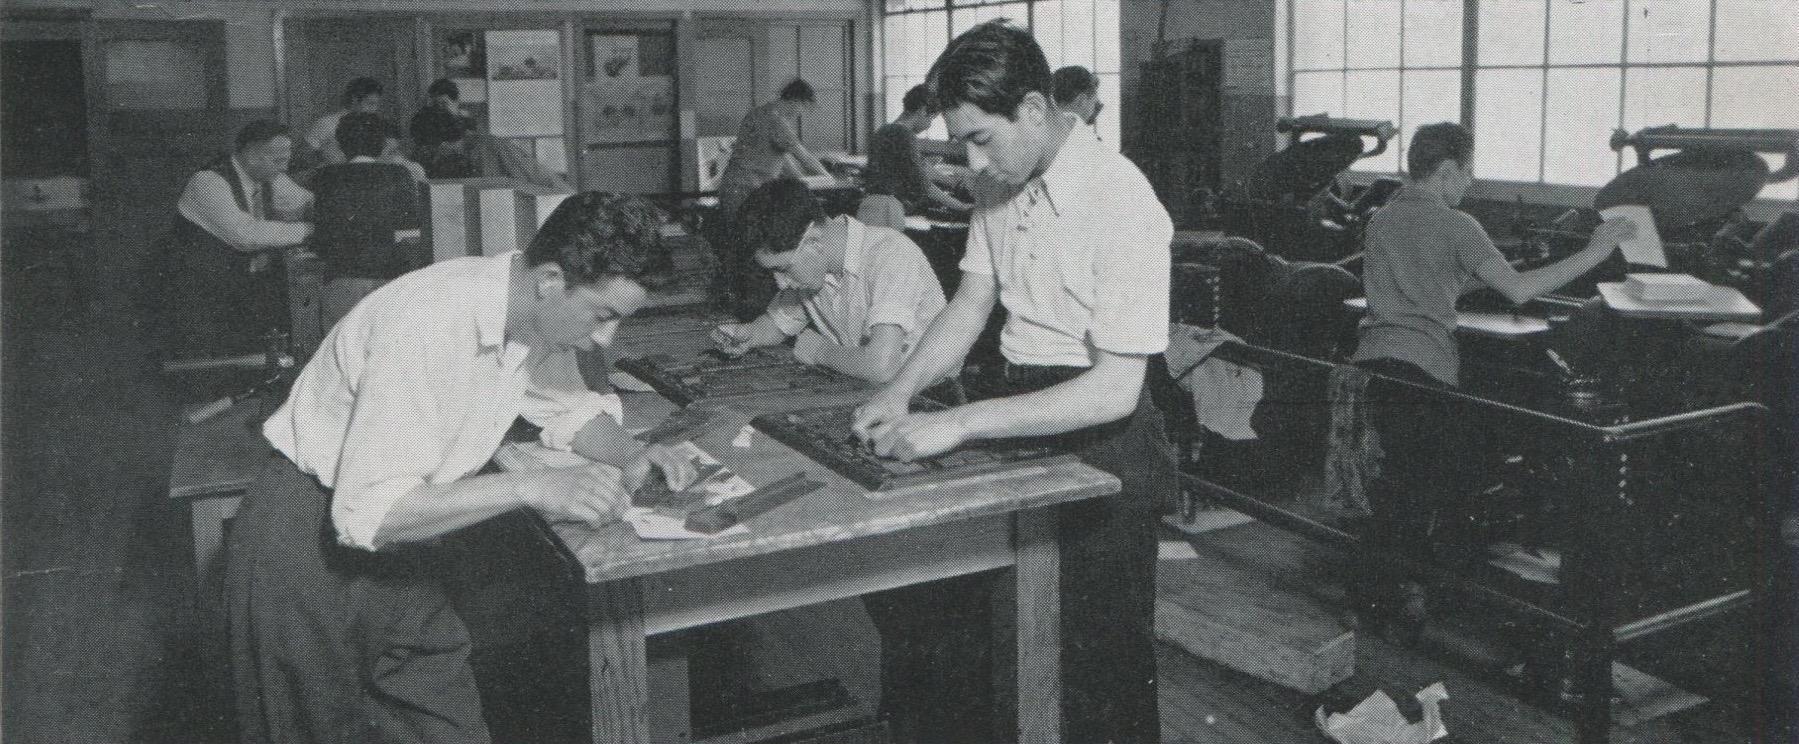 Garfield Print Shop 1940s